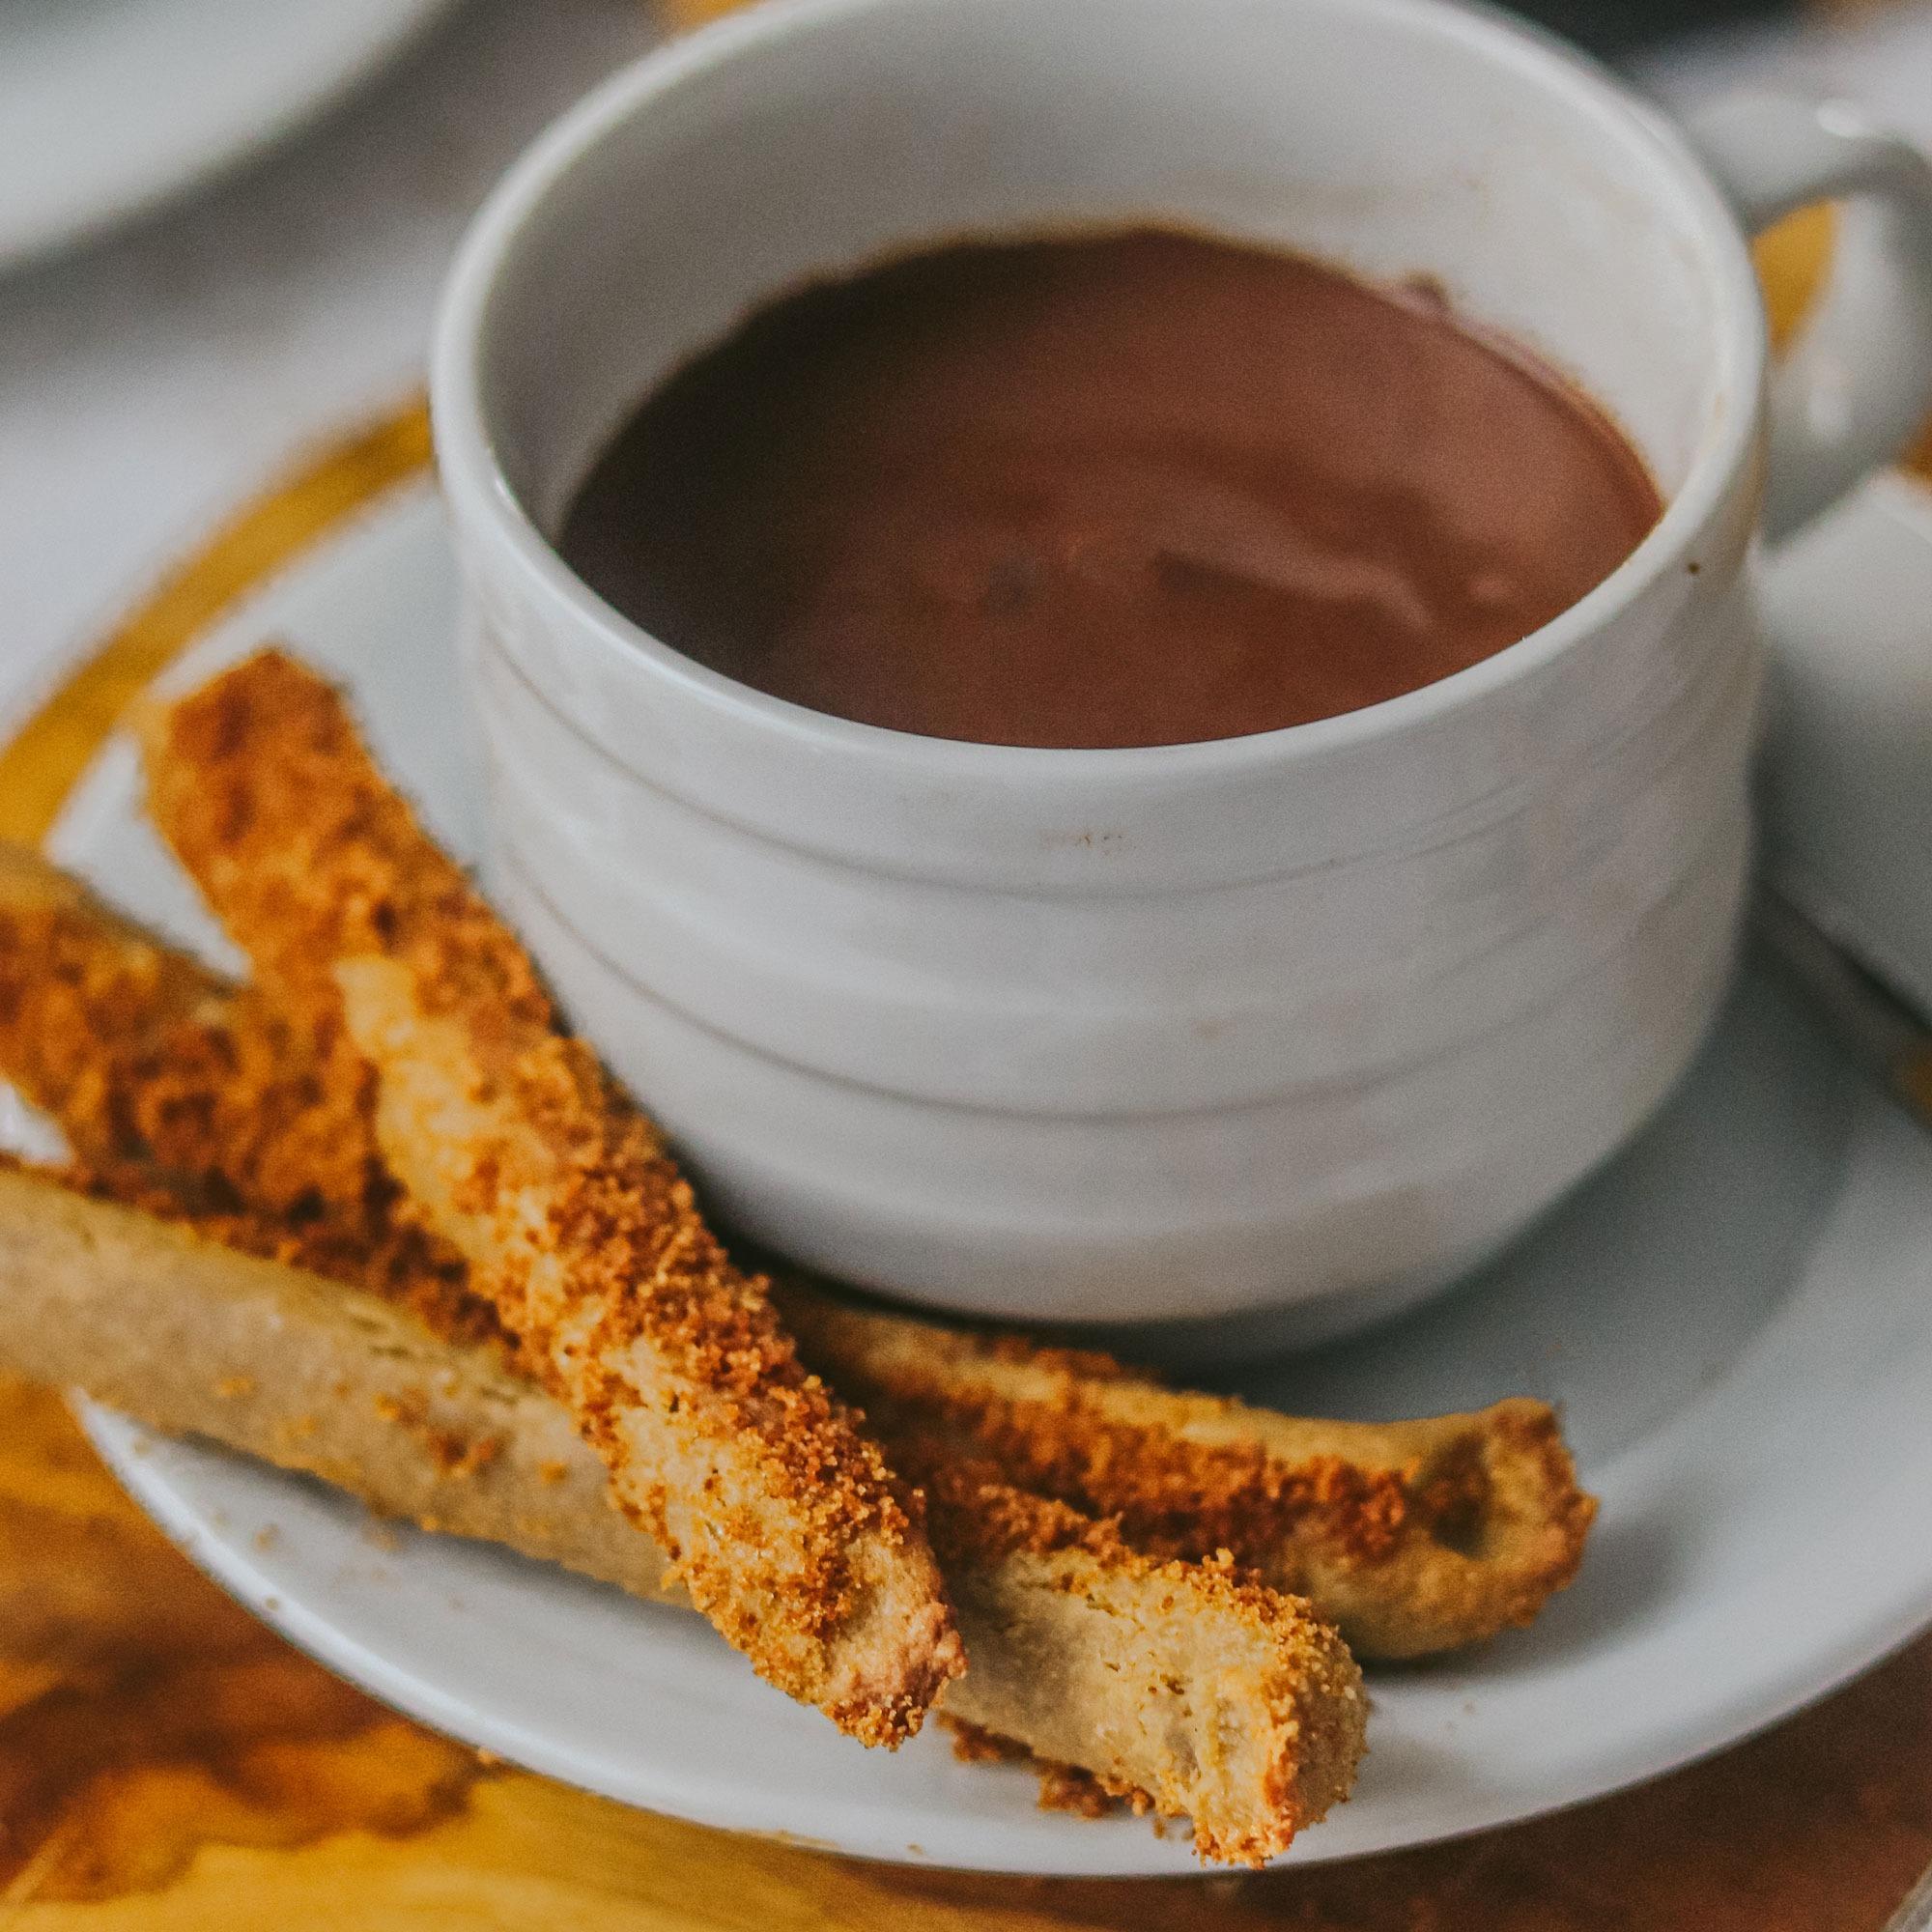 Chocolate con churros sin gluten